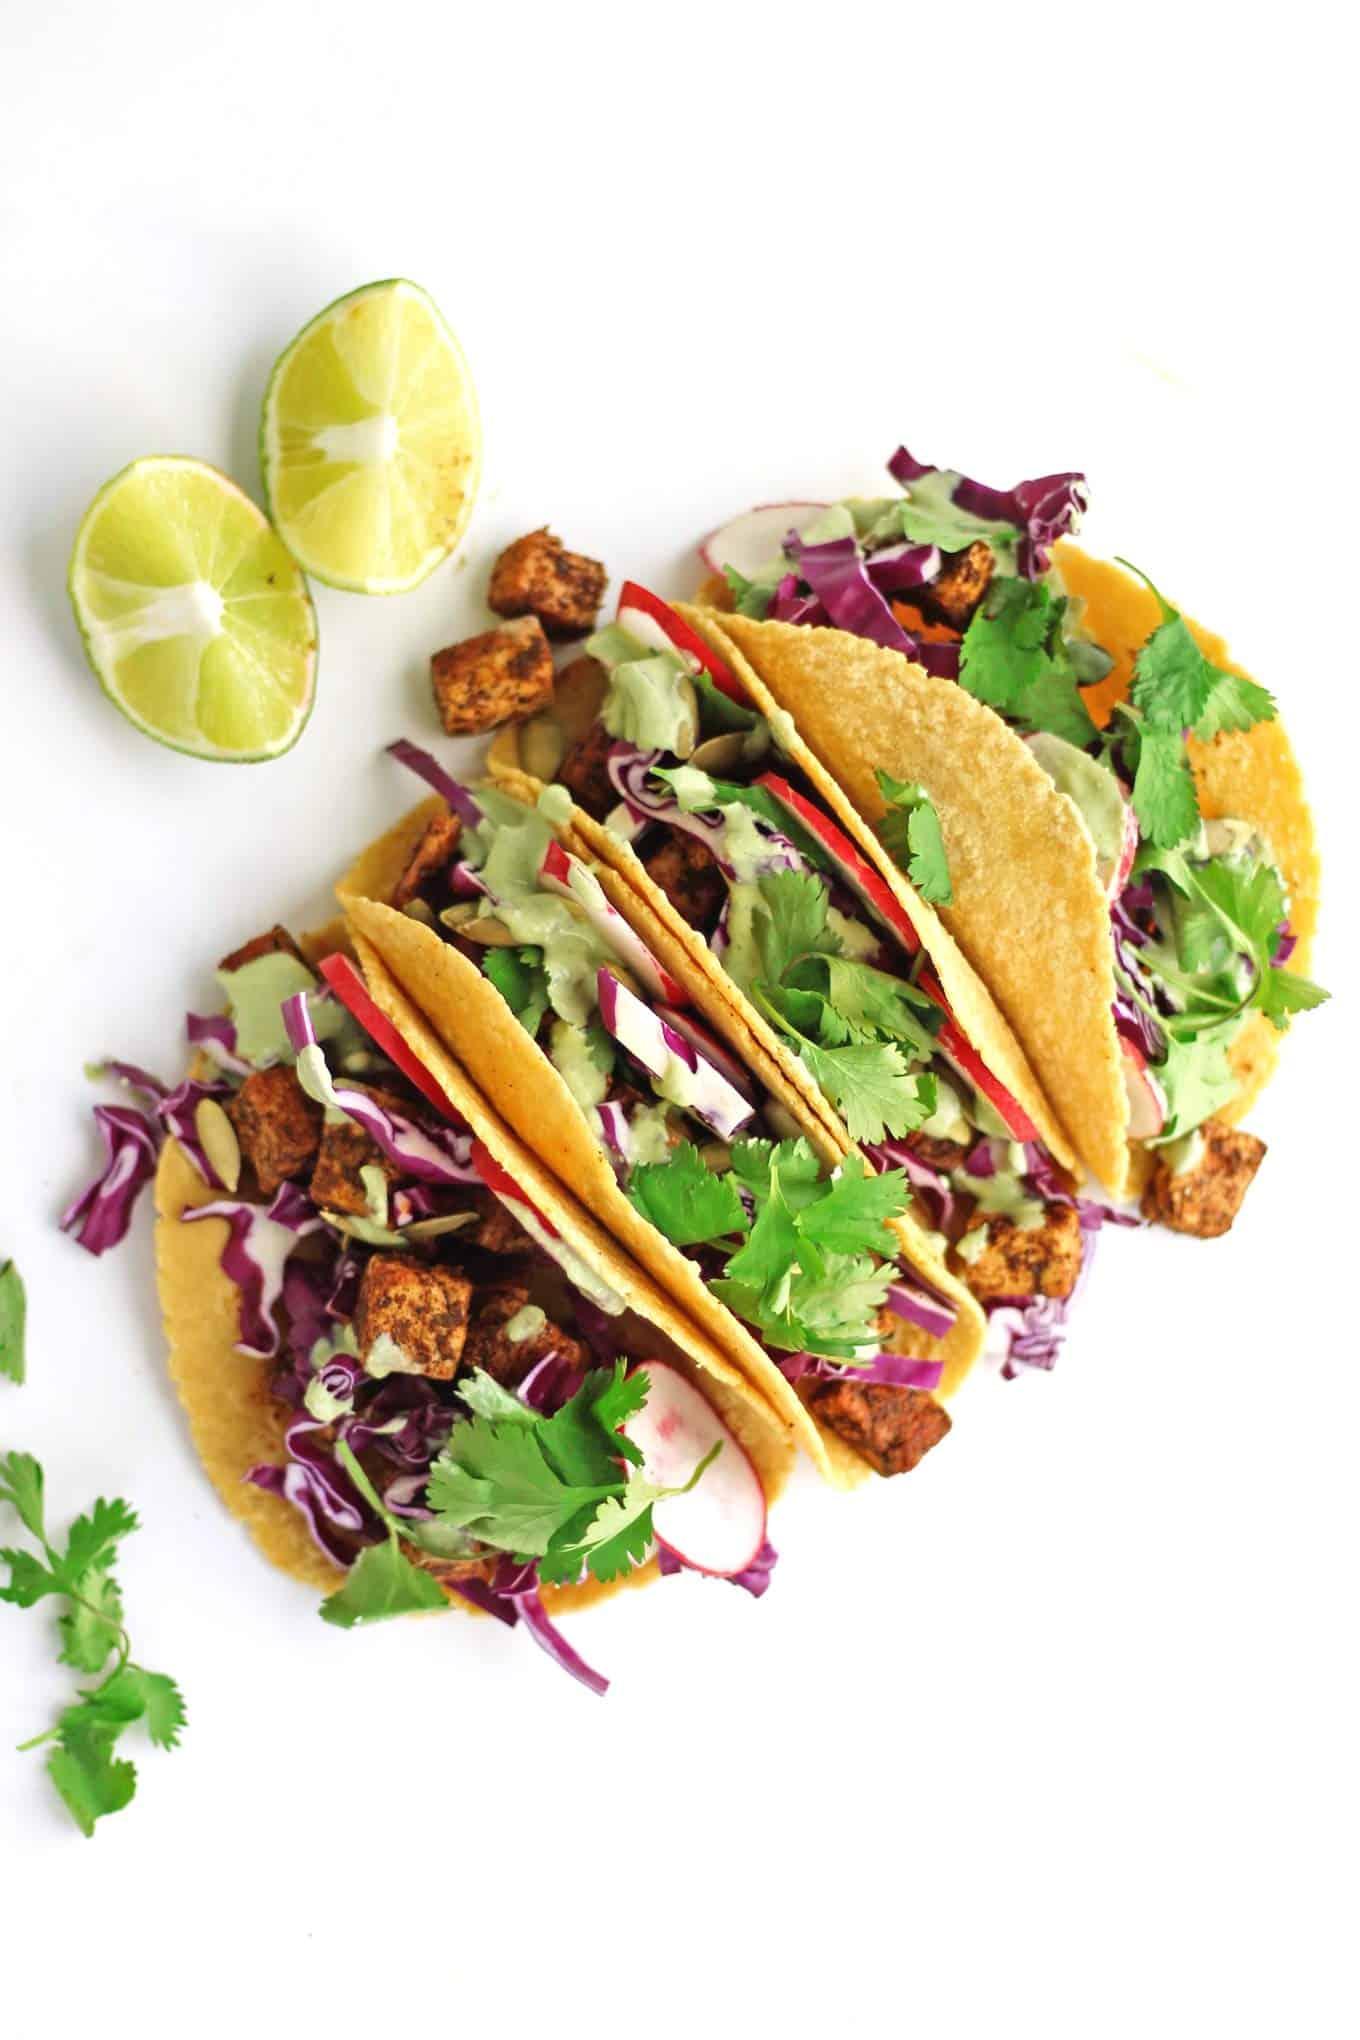 Crispy tofu tacos with cilantro sauce